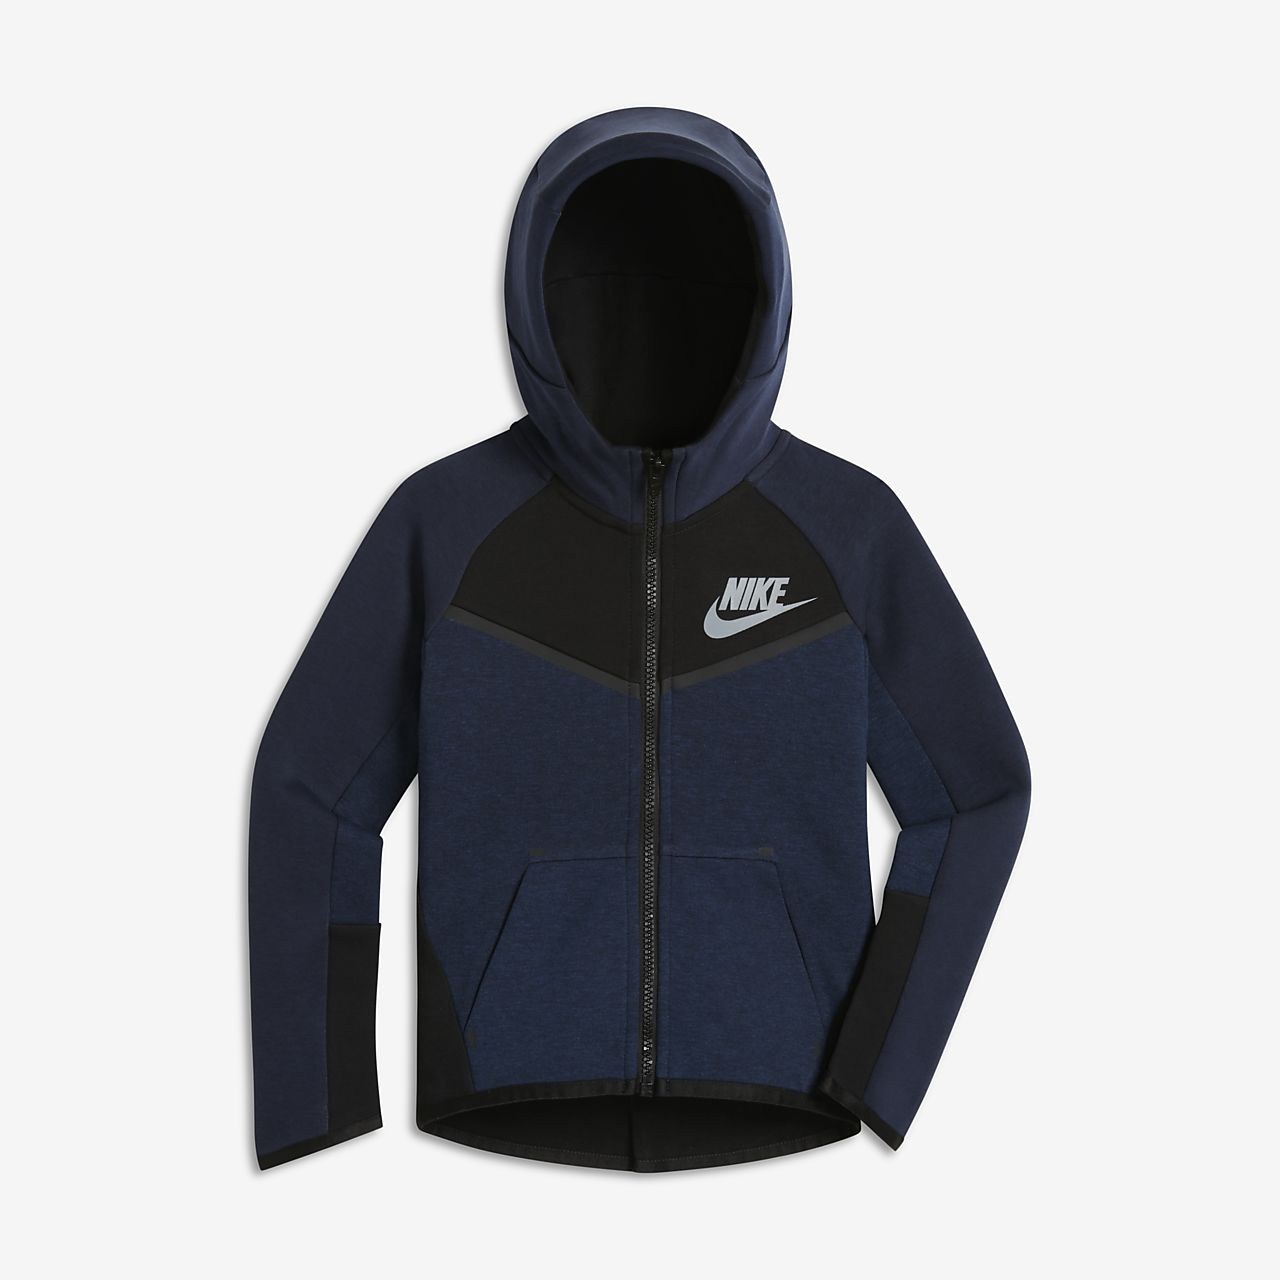 Nike Sportswear Tech Fleece Dessuadora amb caputxa - Nen petit